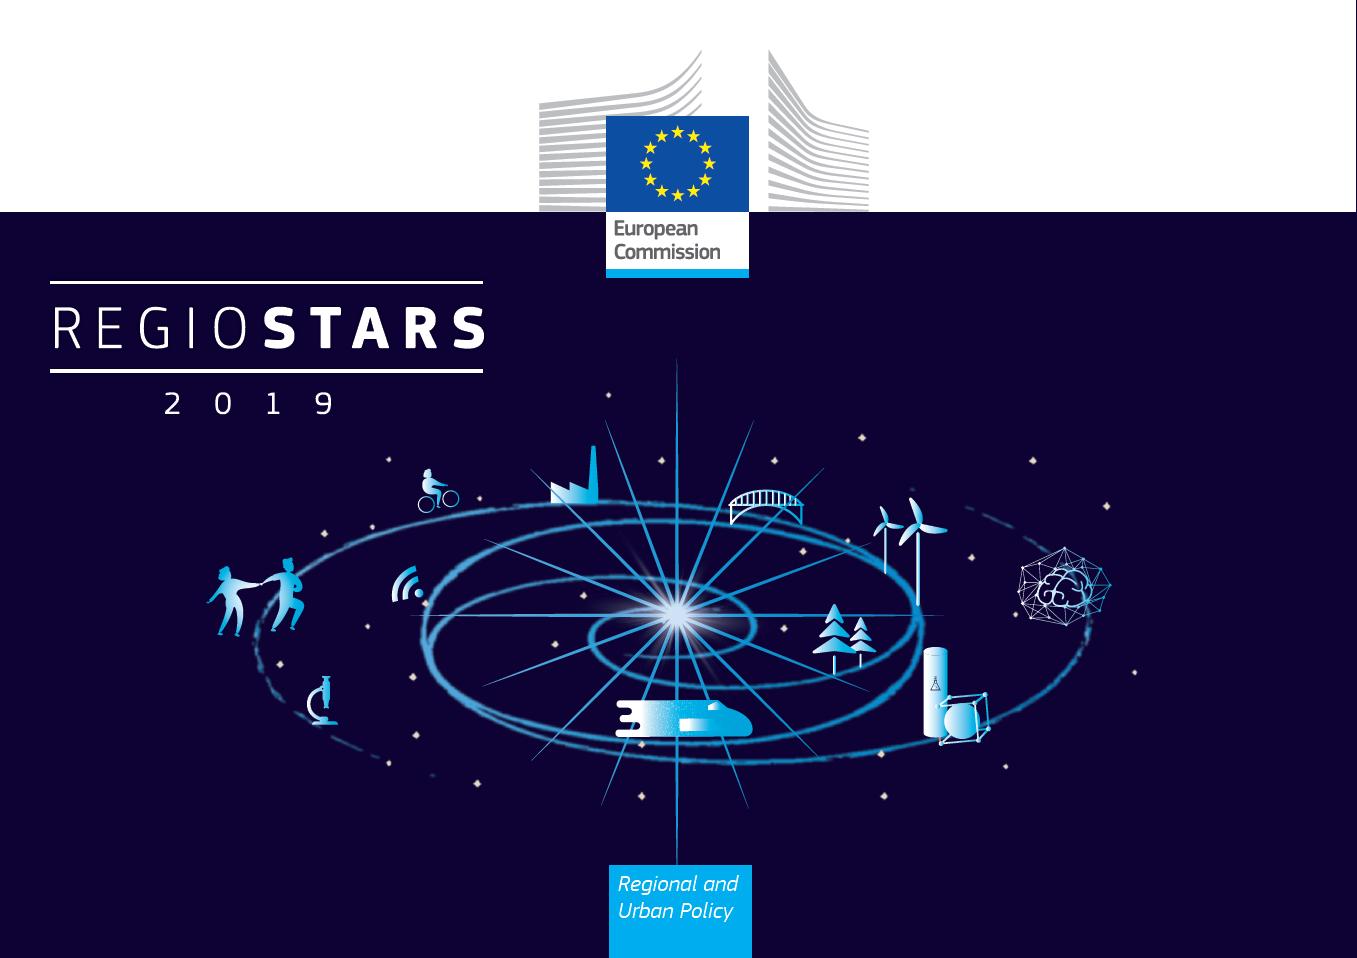 Varaždin u sklopu projekta CityWalk dobio europsku nagradu RegioStars